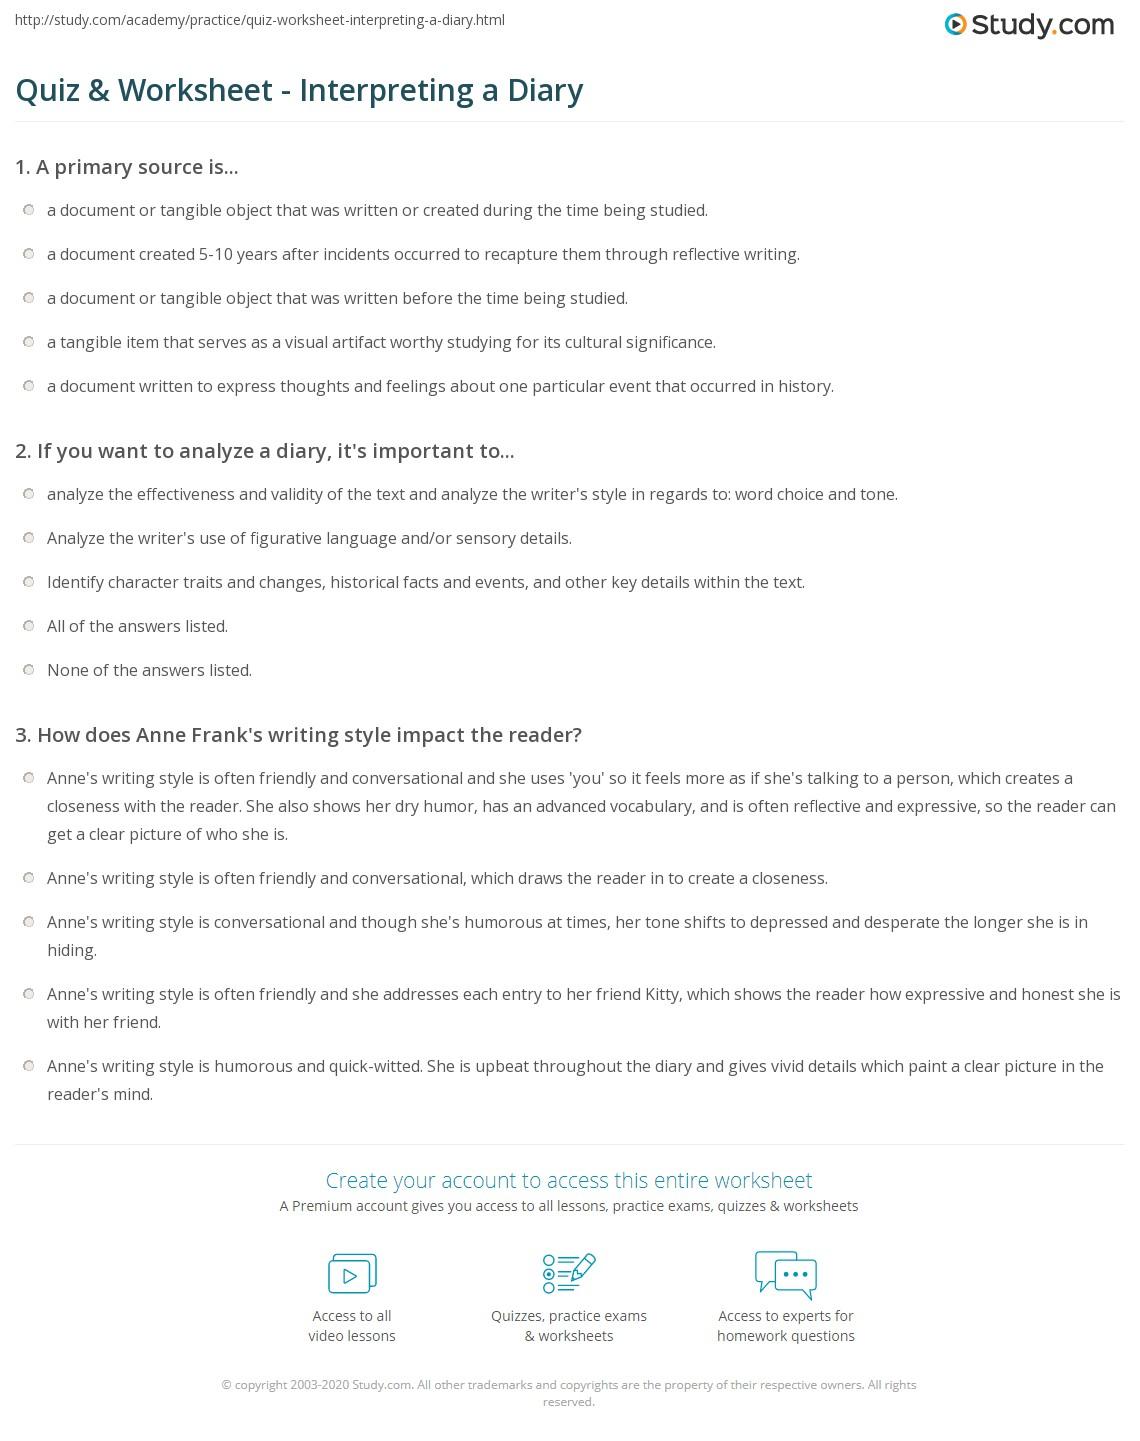 Quiz & Worksheet - Interpreting a Diary | Study.com